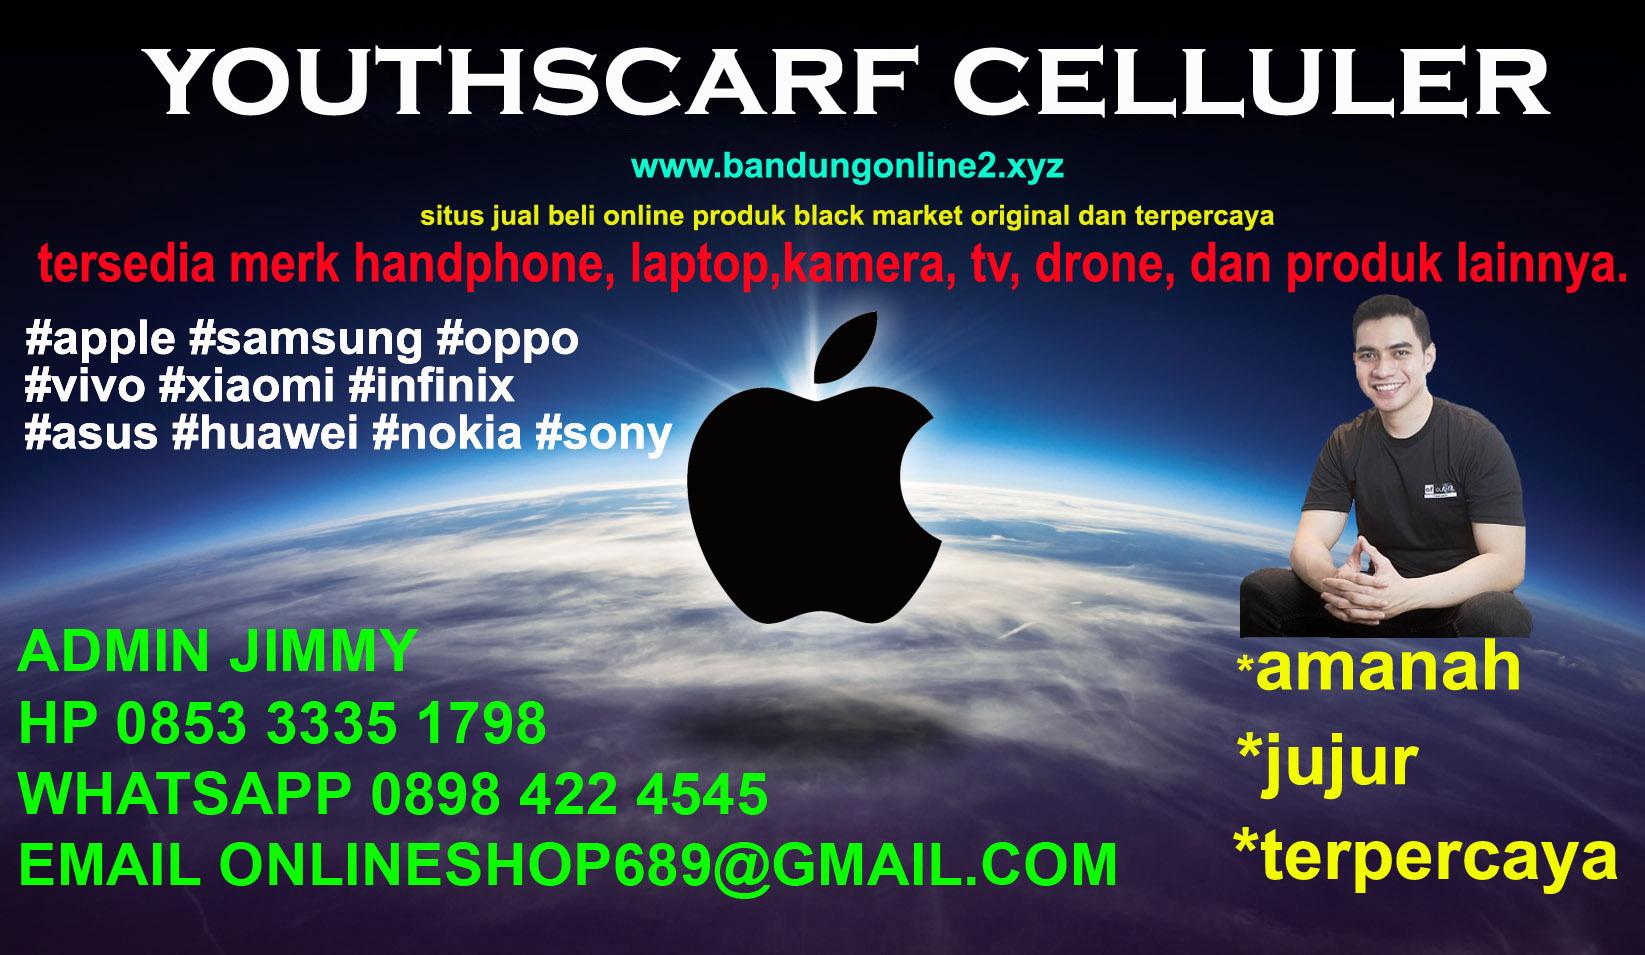 shoppaholic boutique